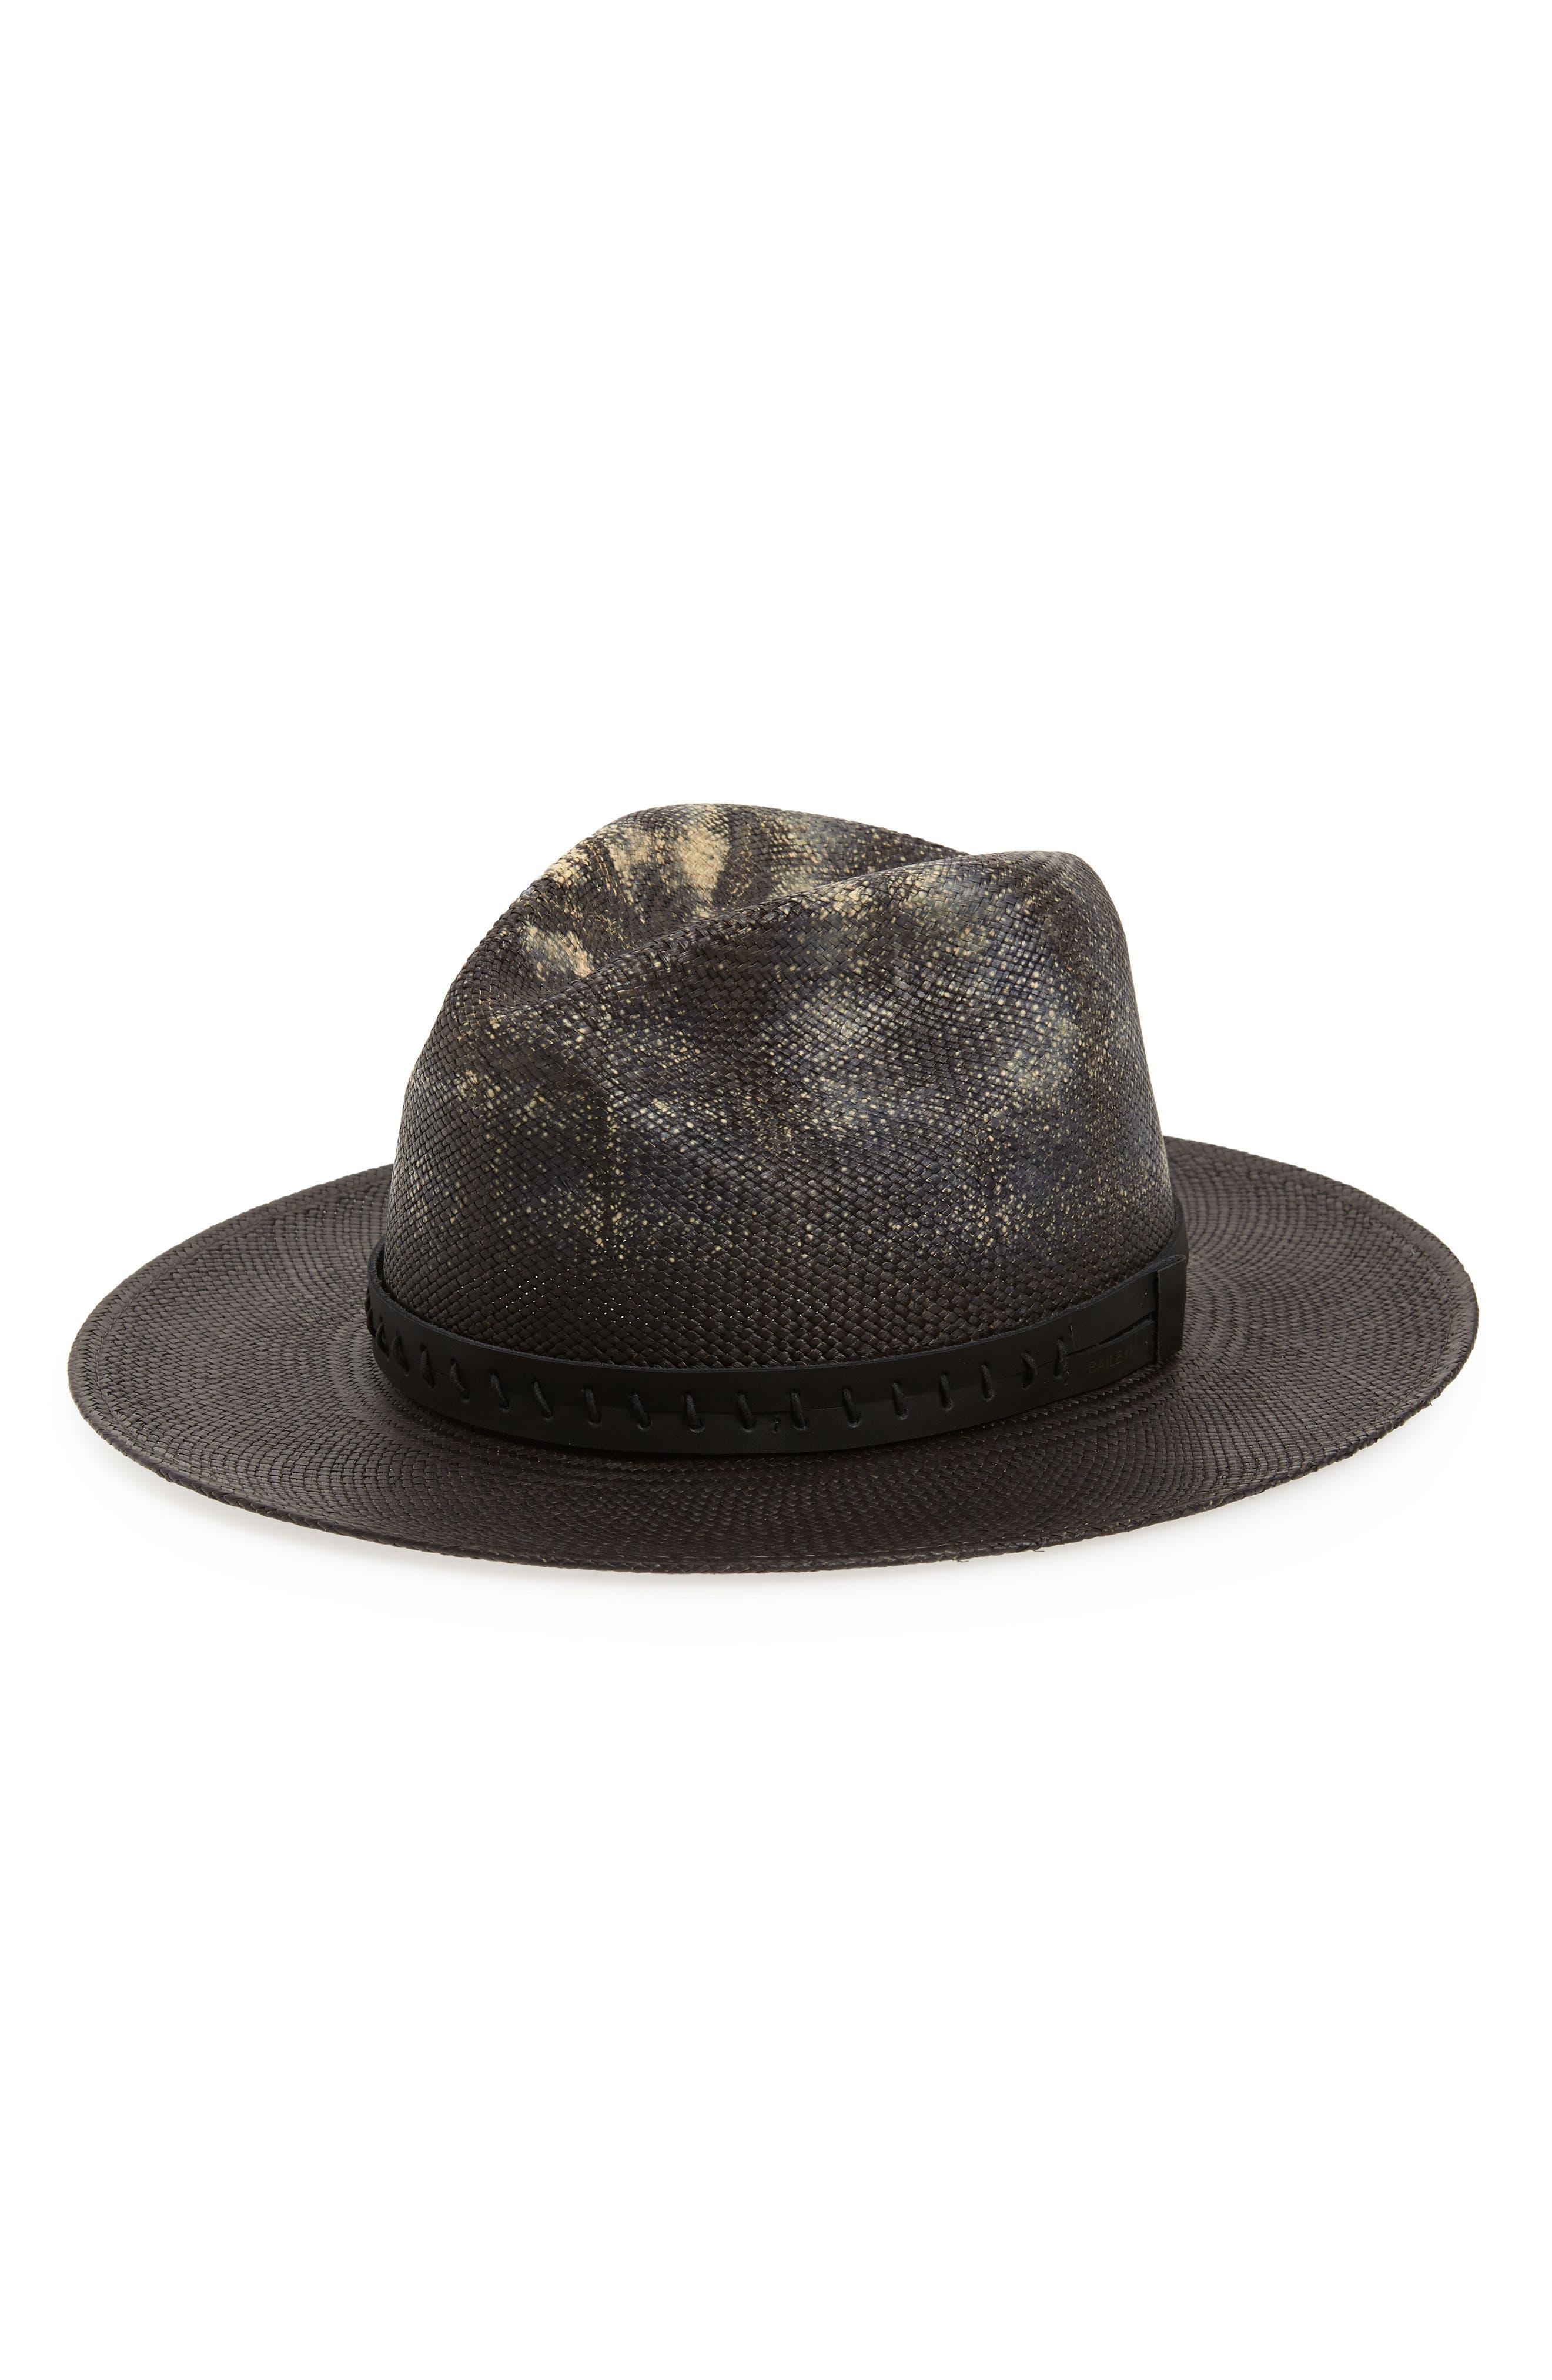 Dune Straw Panama Hat,                         Main,                         color, Distressed Black